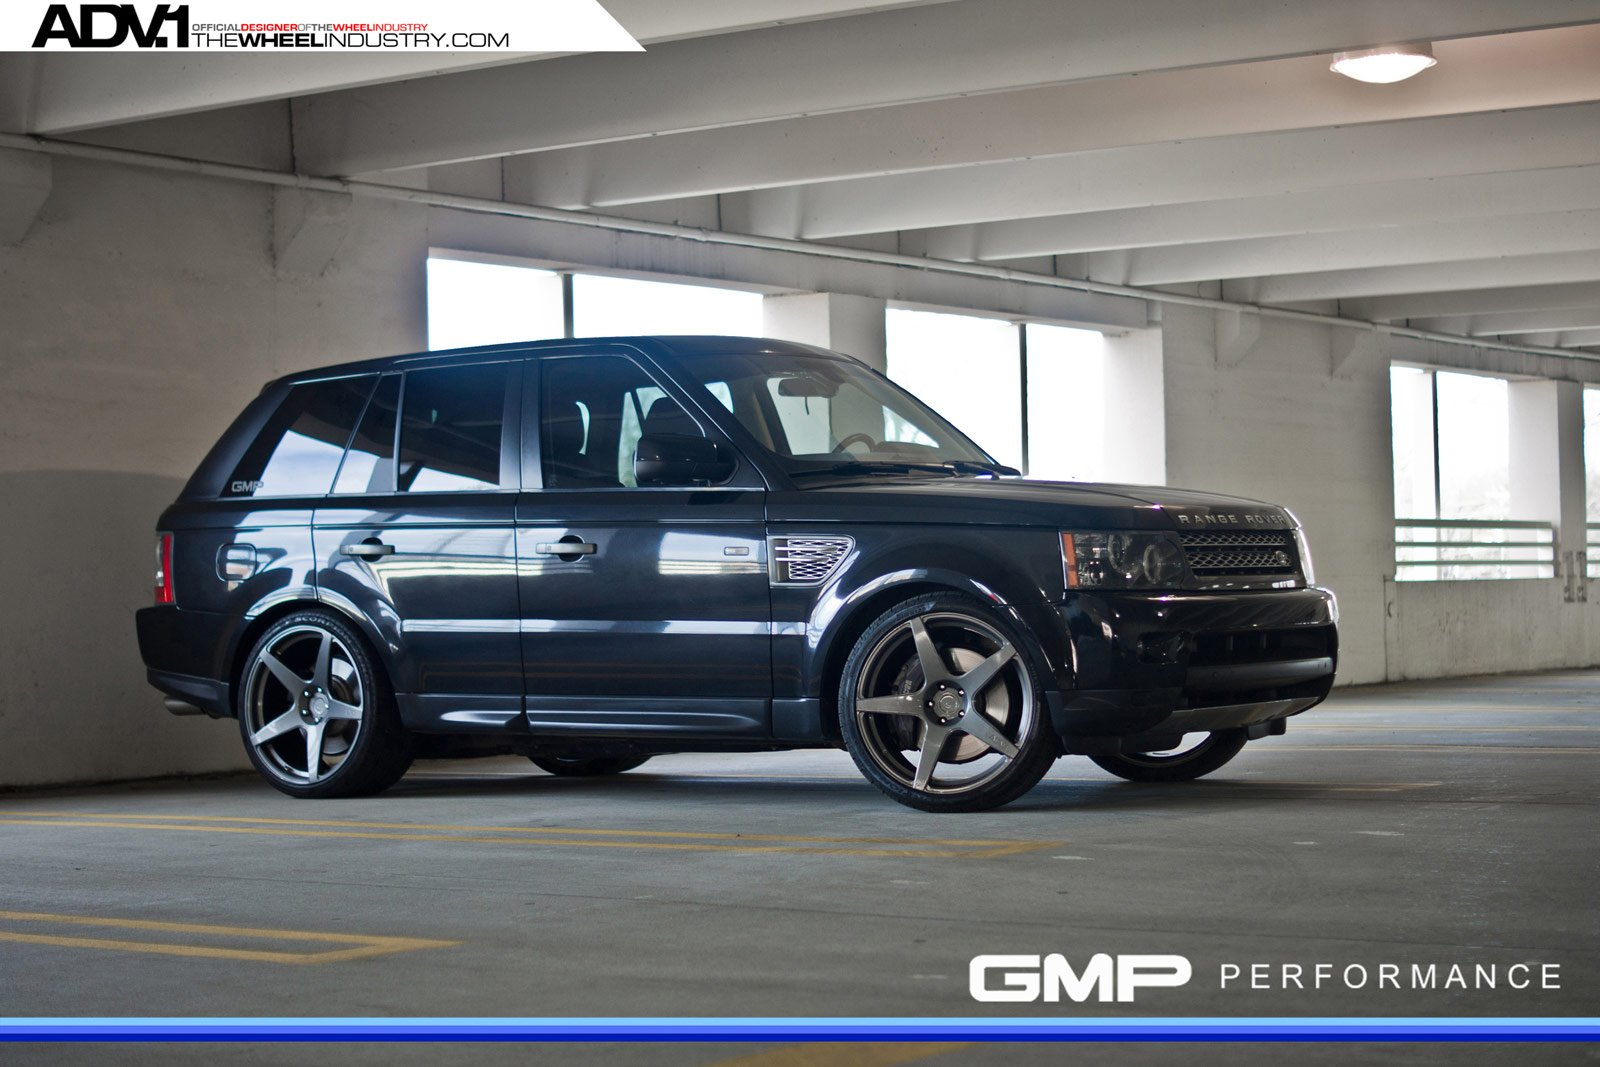 adv1 wheels range rover sport tuning wallpaper 1600x1067. Black Bedroom Furniture Sets. Home Design Ideas